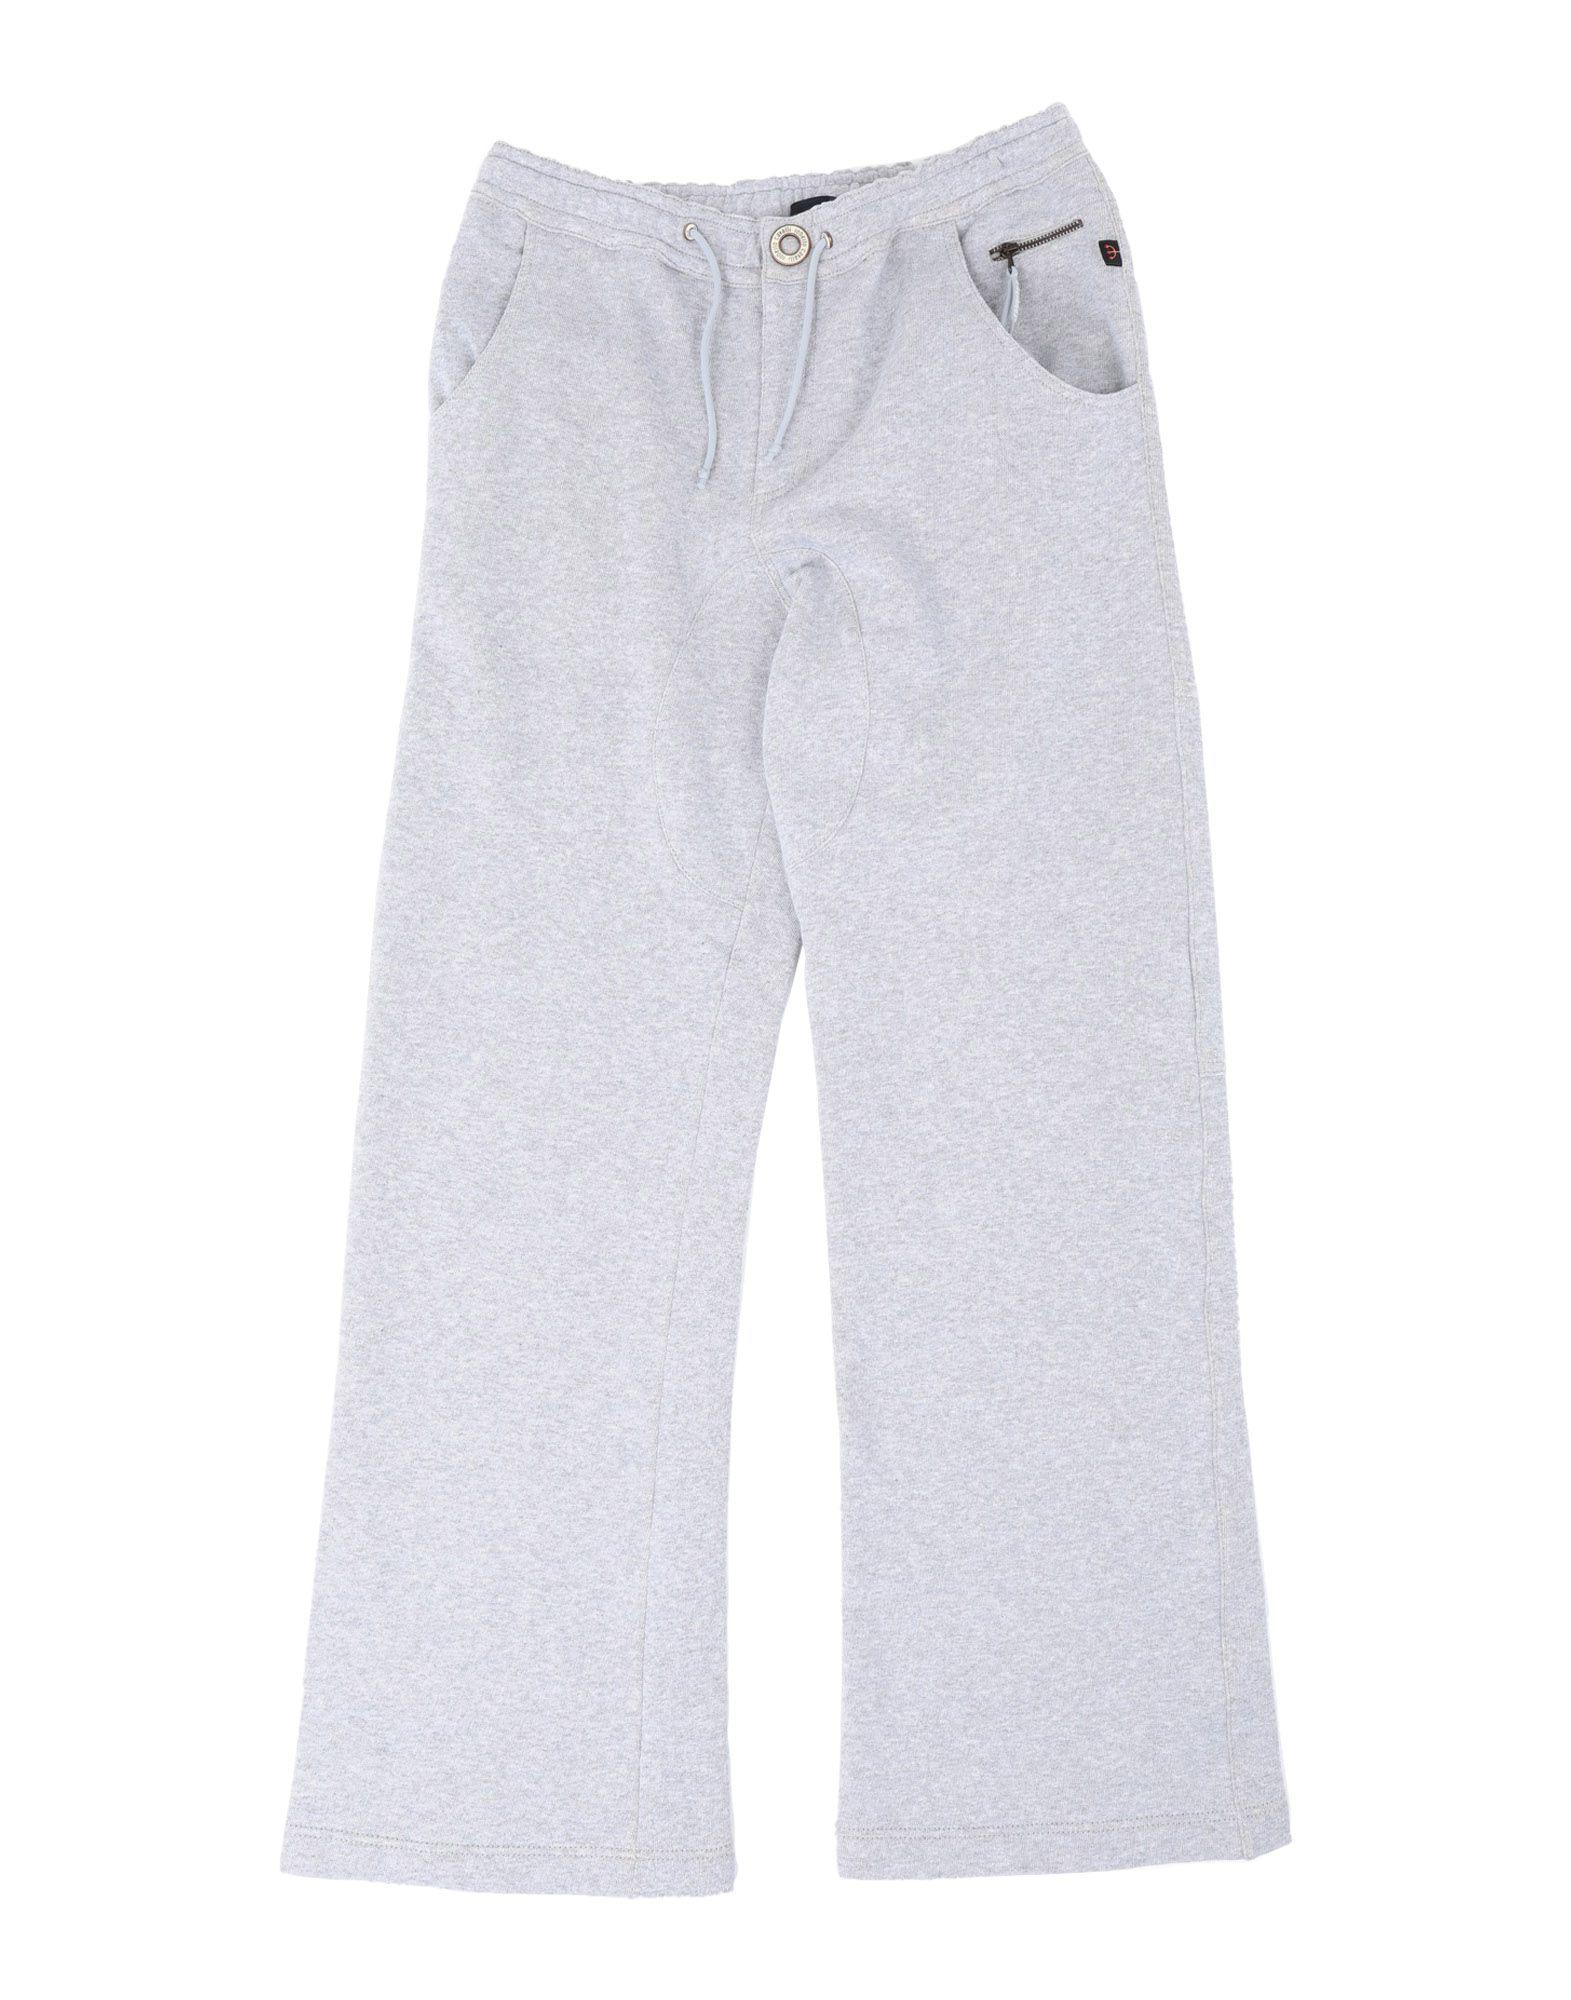 Roberto Cavalli Grey Cotton Trousers